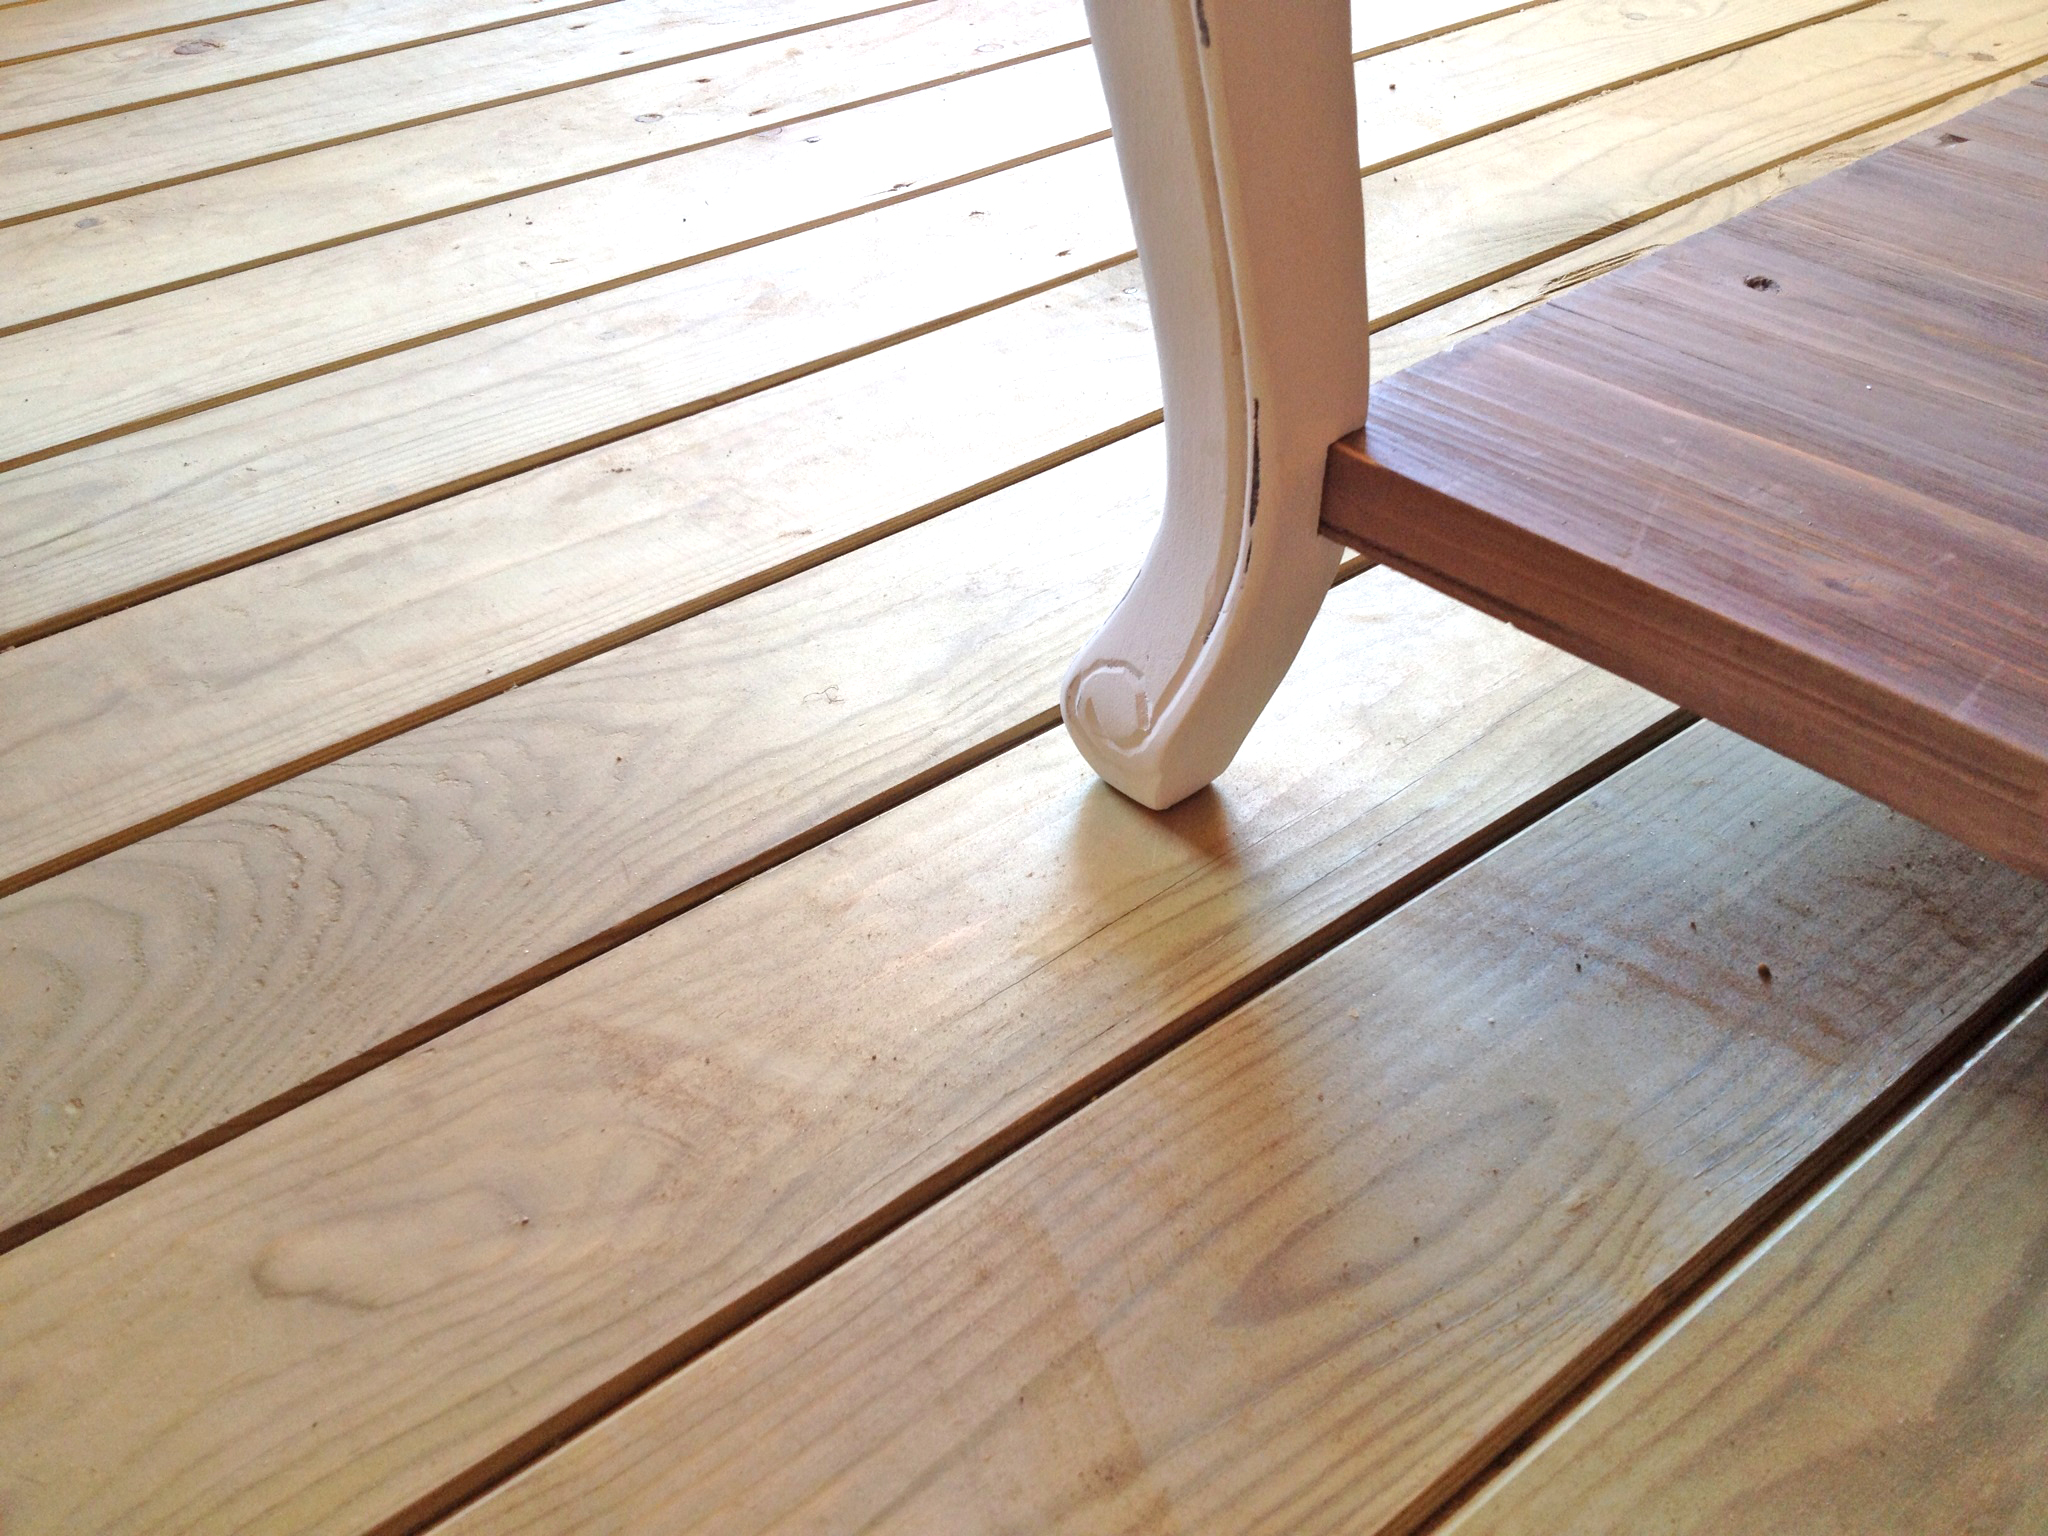 18mm houten vloerpakket geïmpregneerd incl. regelwerk (t.b.v. blokhut)